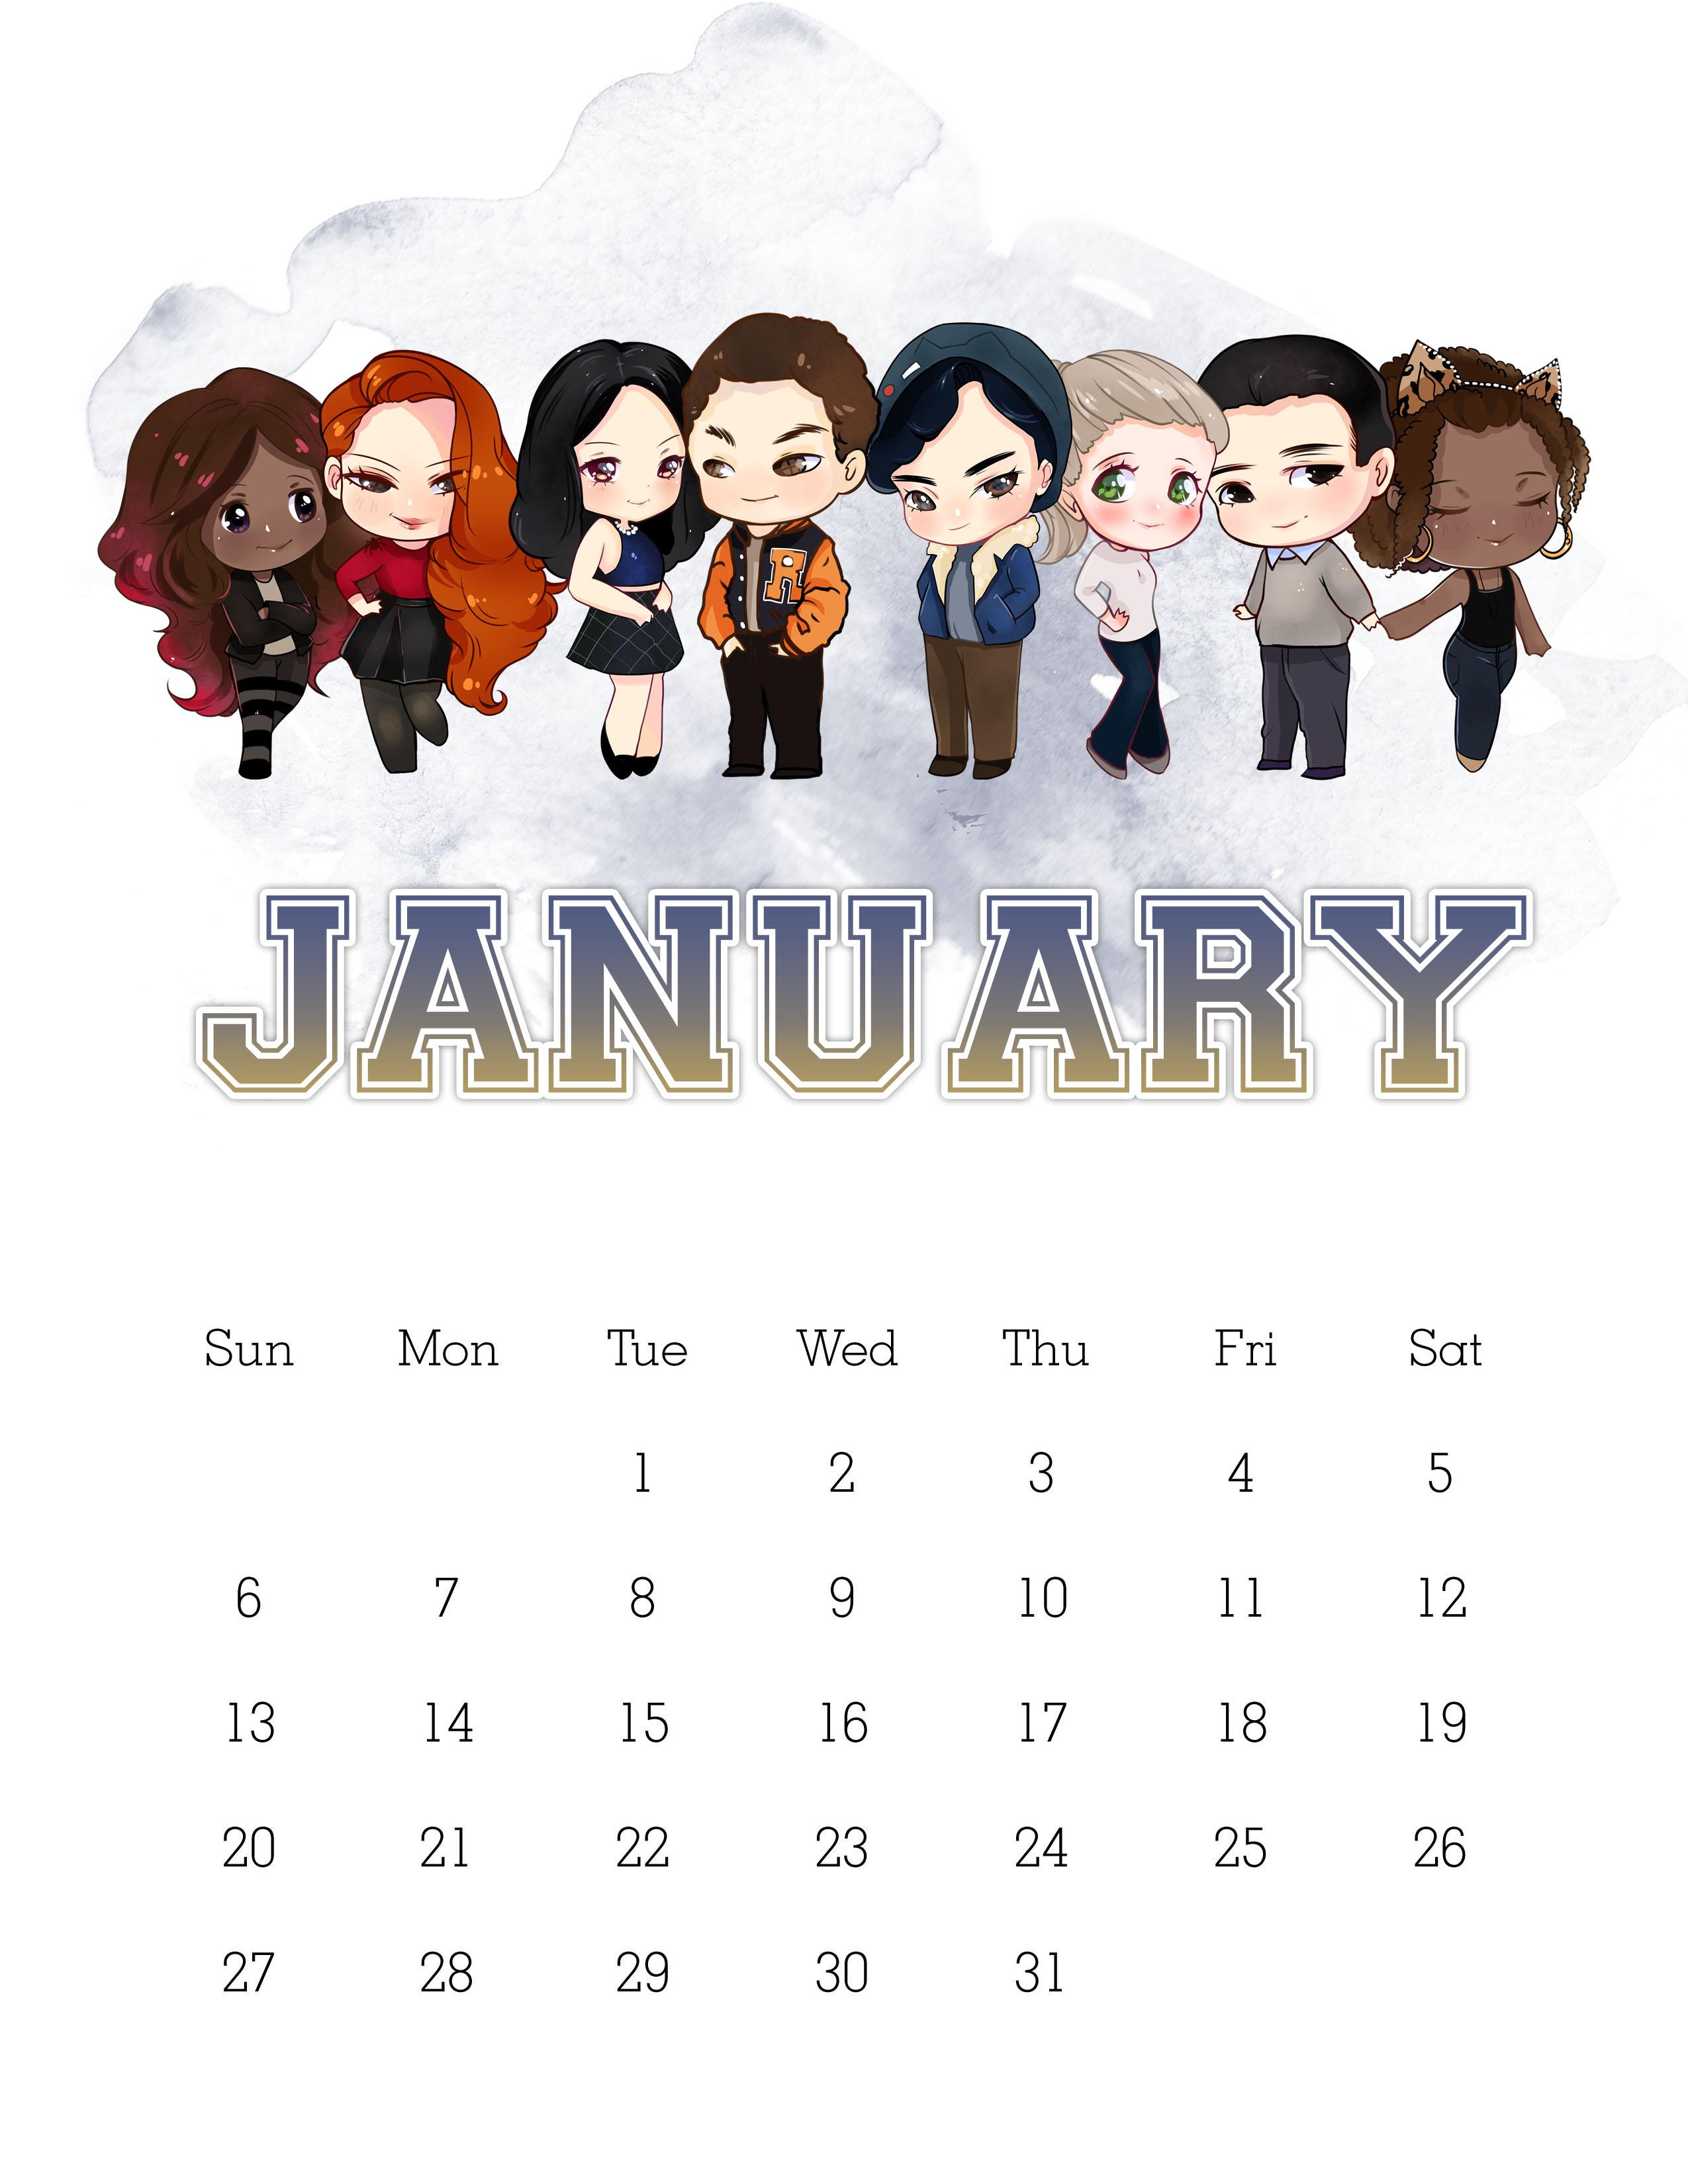 Calendario 2019 Disney Para Imprimir.Free Printable 2019 Riverdale Calendar The Cottage Market